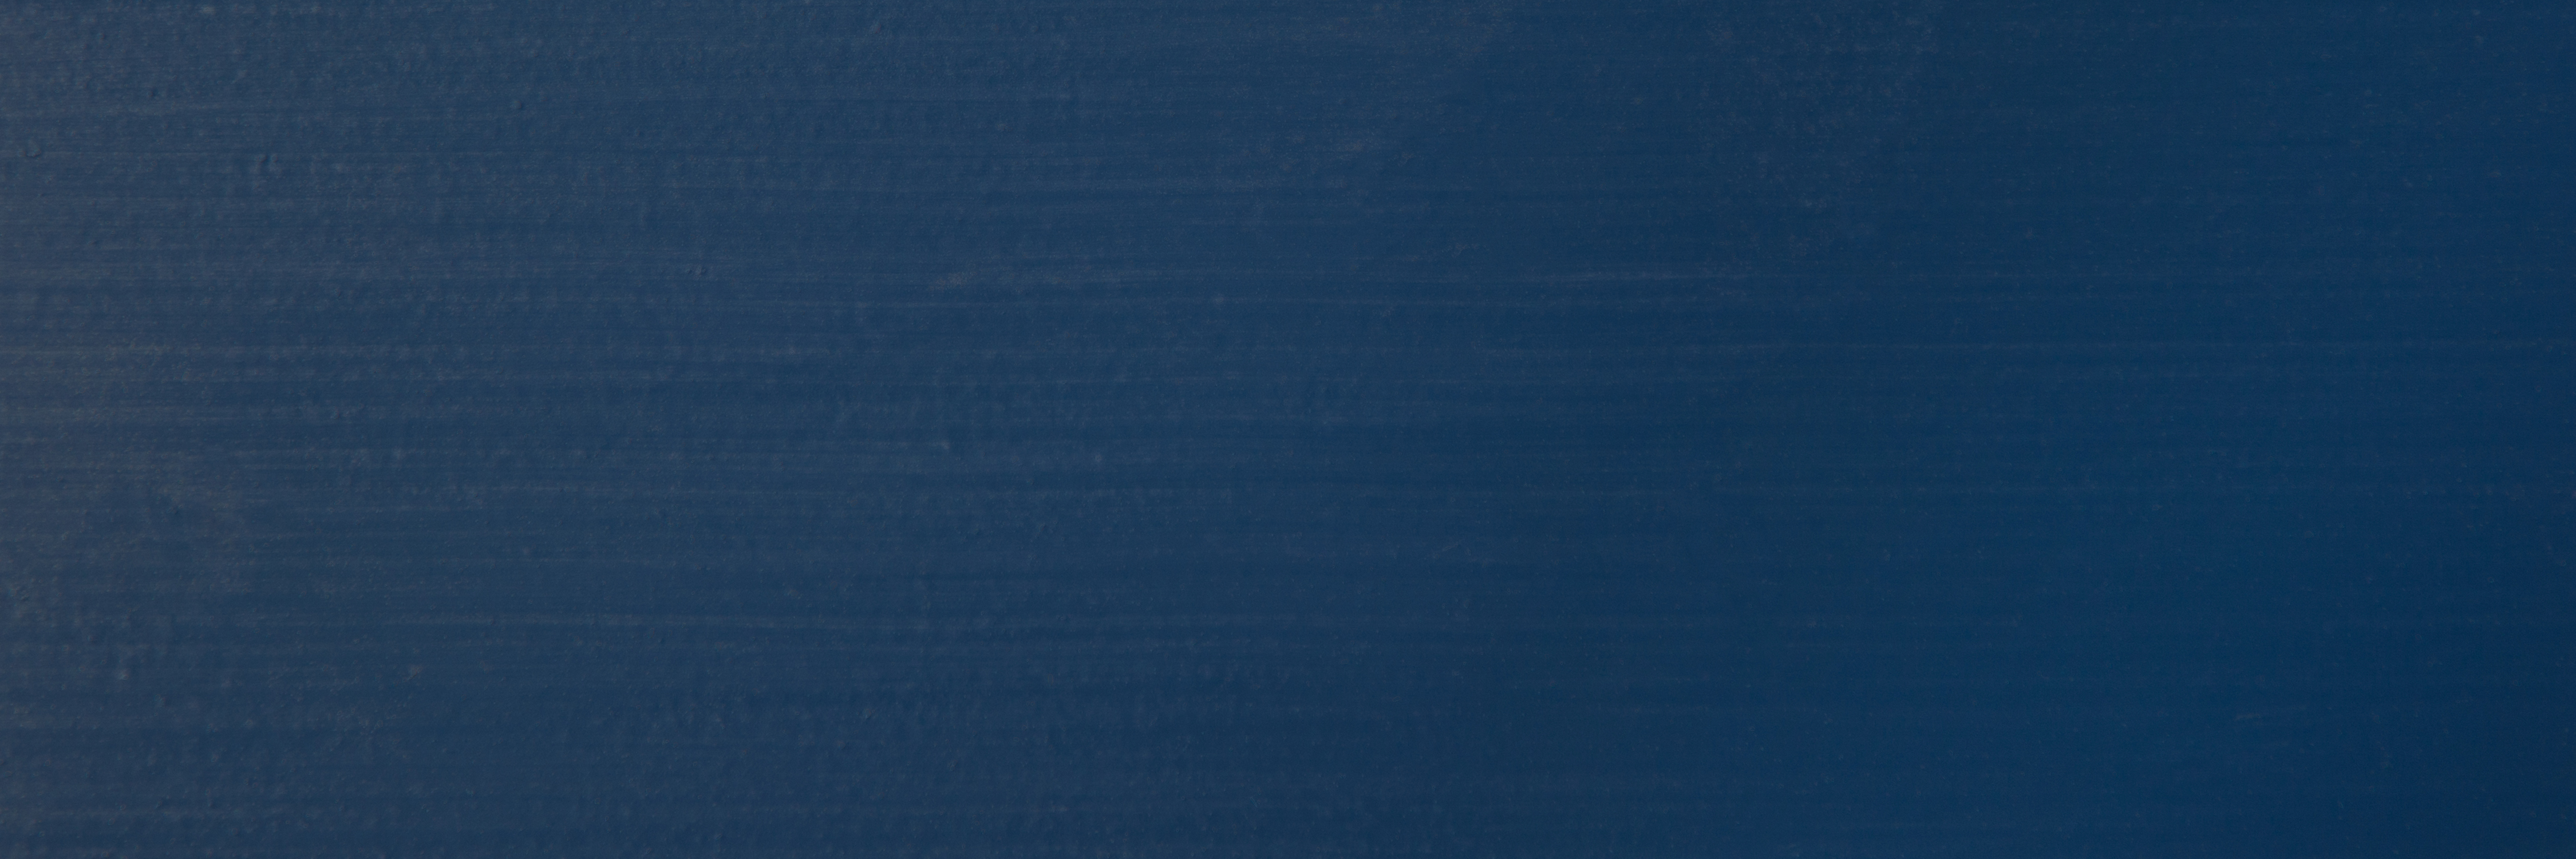 NCL-07 | Saphir blue